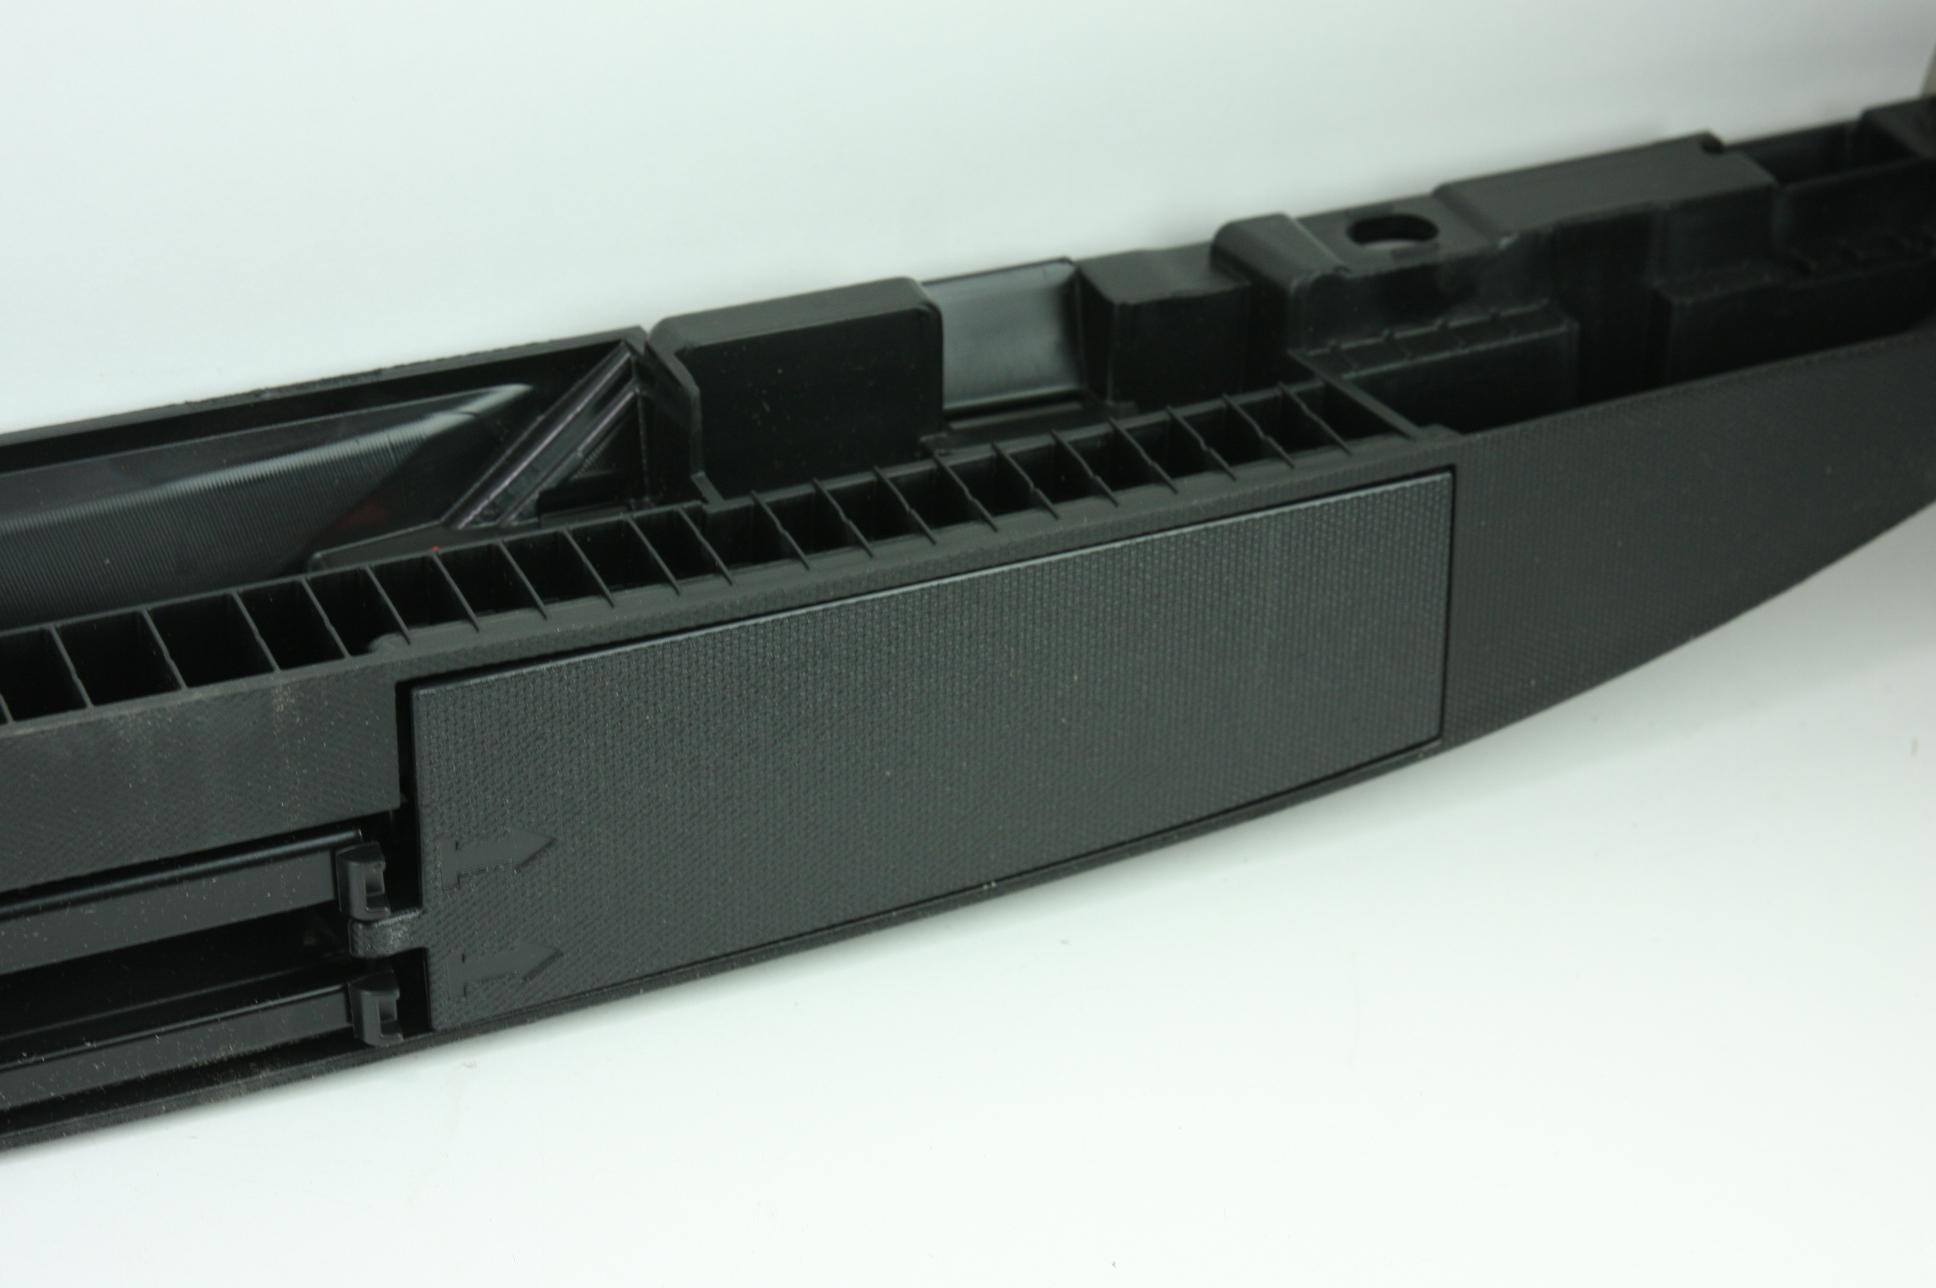 *** New Genuine OEM 23324213 GM Roof Rack Luggage Carrier Side Rail LH 84016250 - image 9